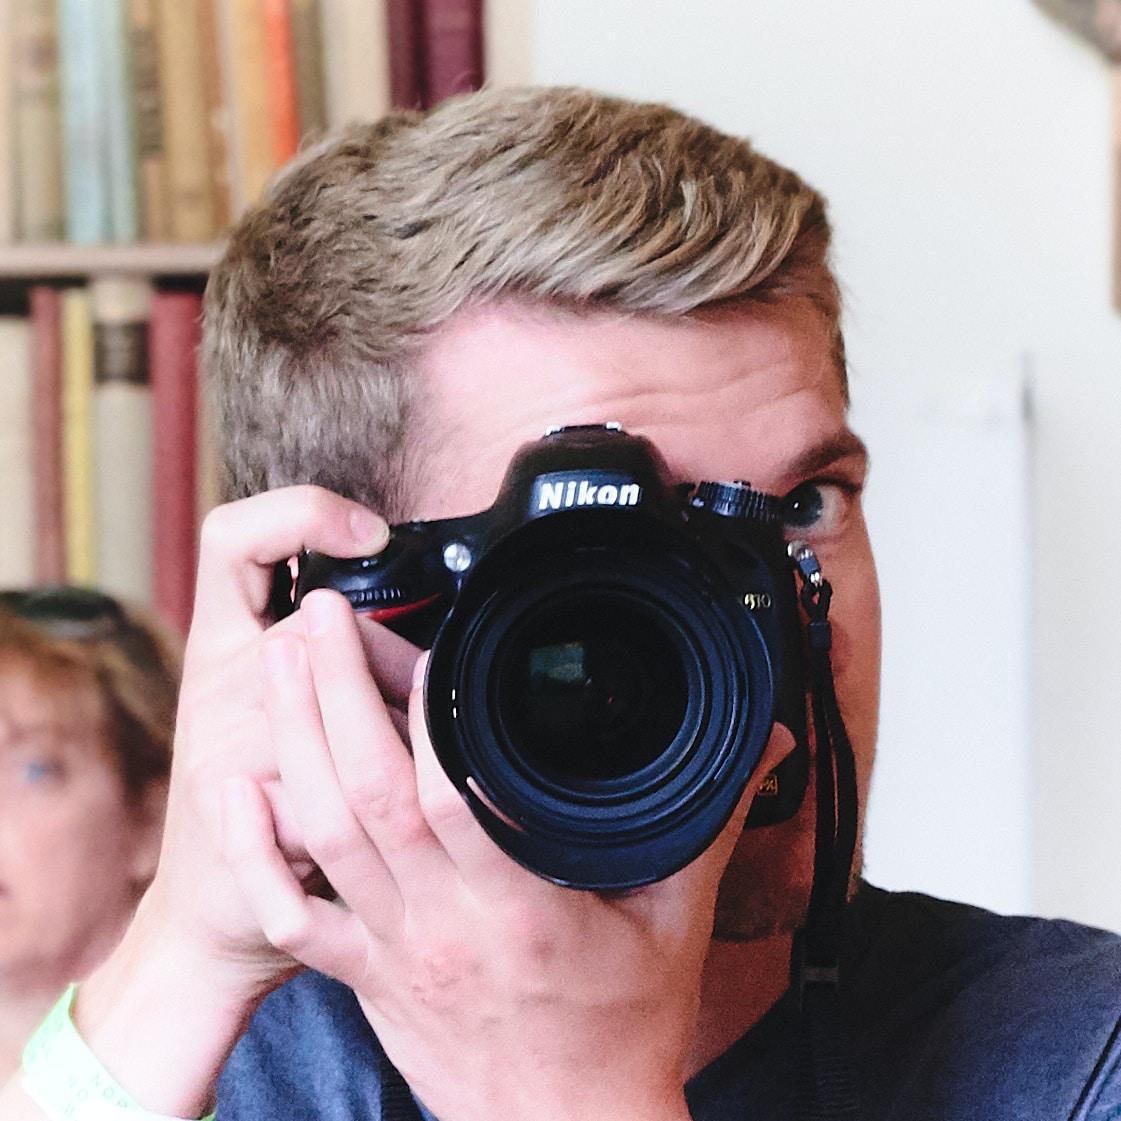 Go to Christian Lambert's profile